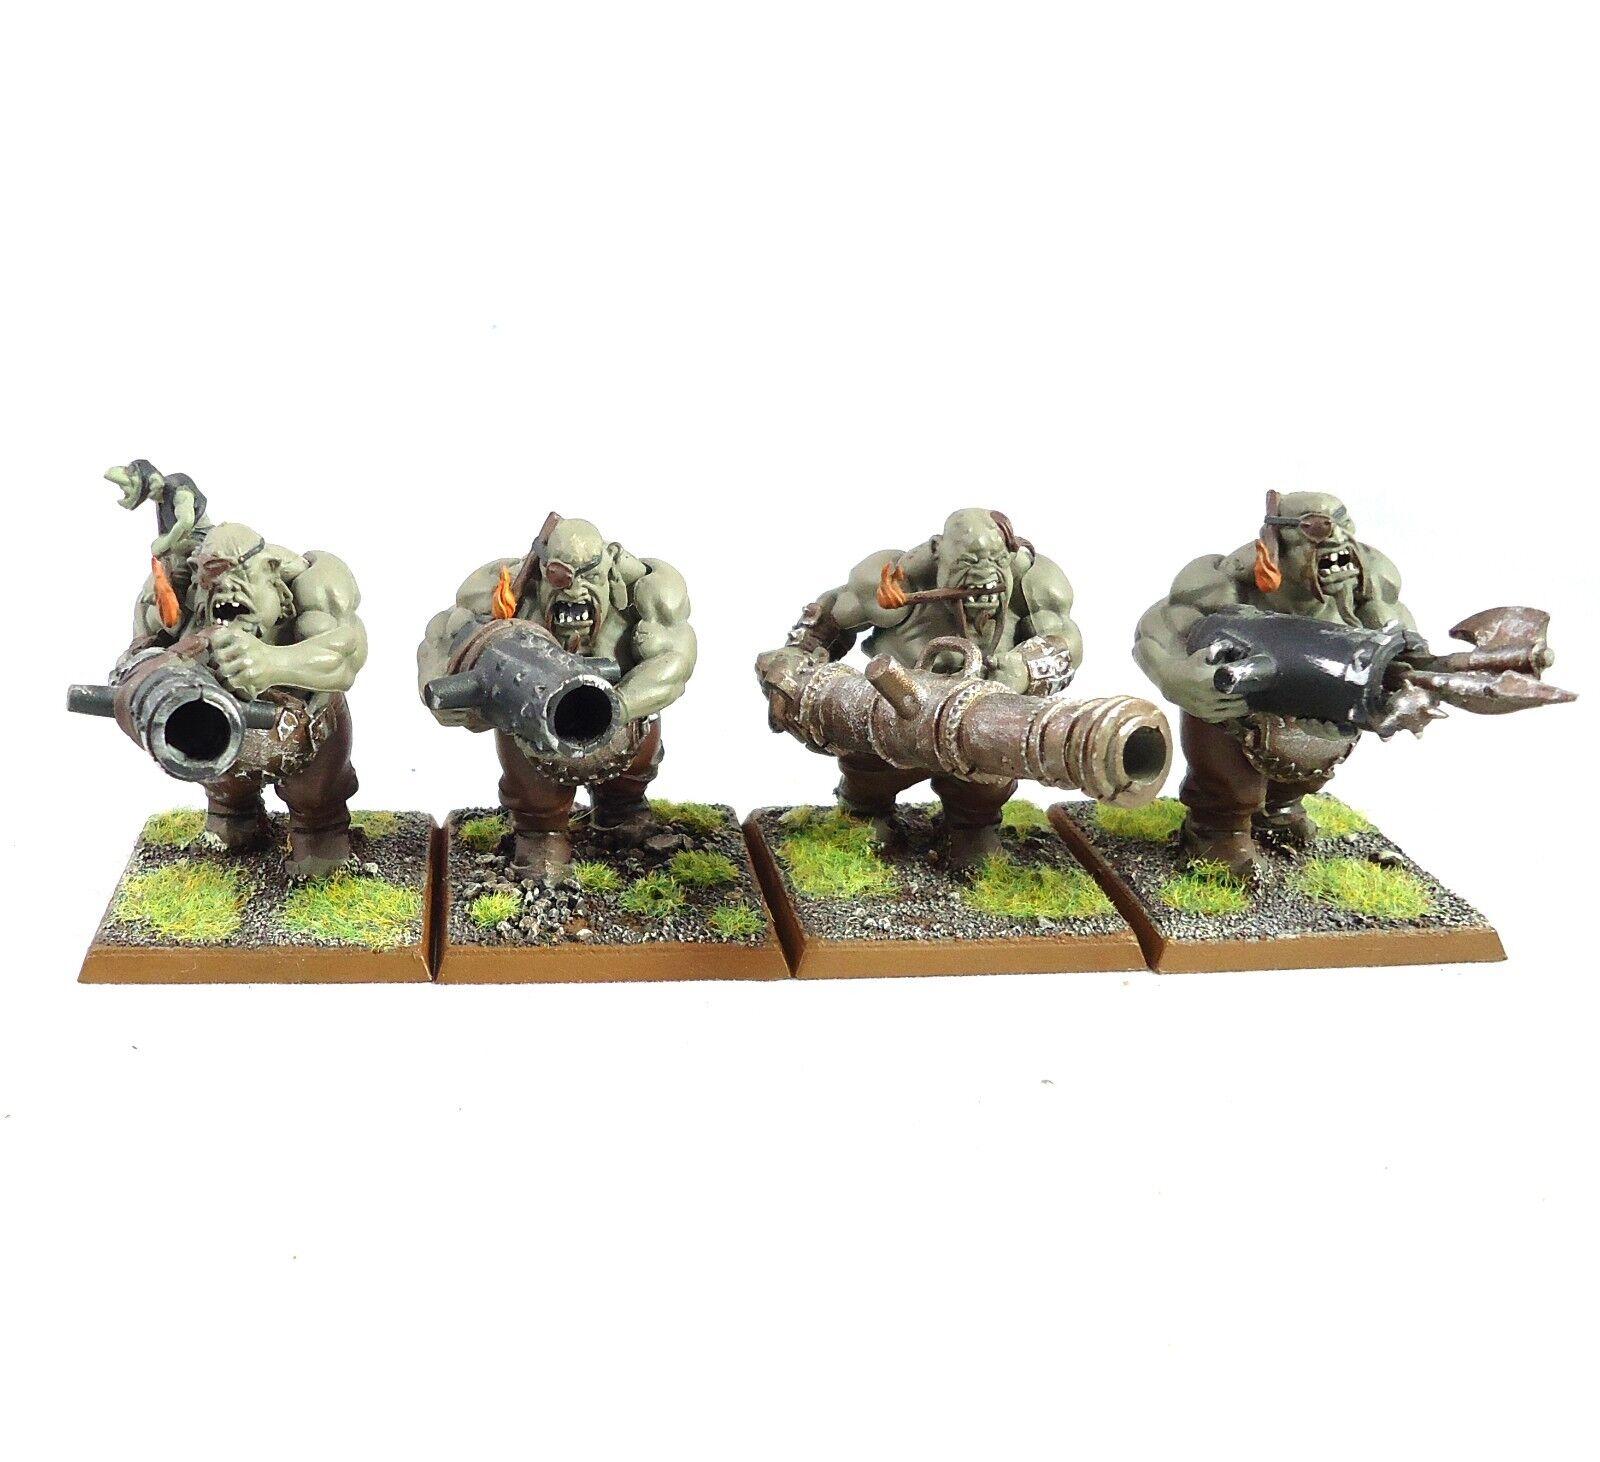 Warhammer Fantasy   Age Of Sigmar Army Ogre Kingdoms Leadbelchers x4 Painted